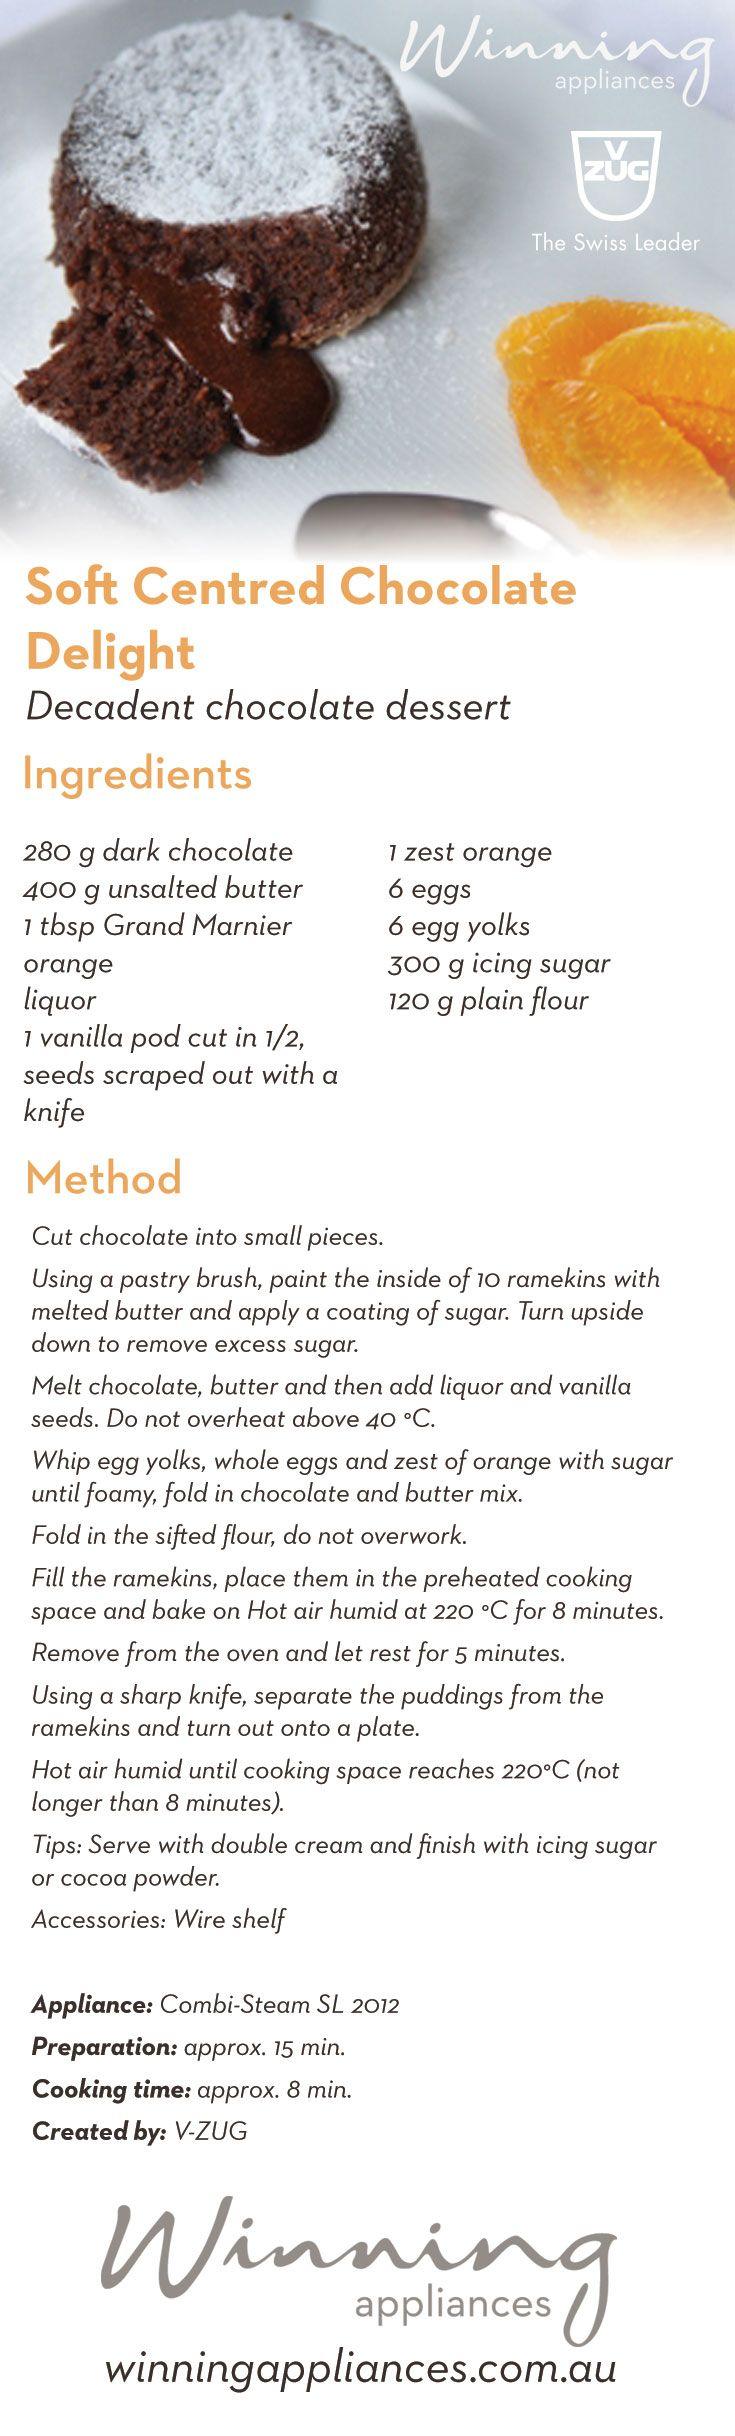 "Try V-Zug's latest recipe ""Soft Centred Chocolate Delight"" A decadent chocolate dessert with a molten centre. http://www.winningappliances.com.au/recipes/soft-centred-chocolate-delight/ #kitchenclub #winningappliances #winning #recipe #chocolate #choclatedessert #moltenchocolatecake"